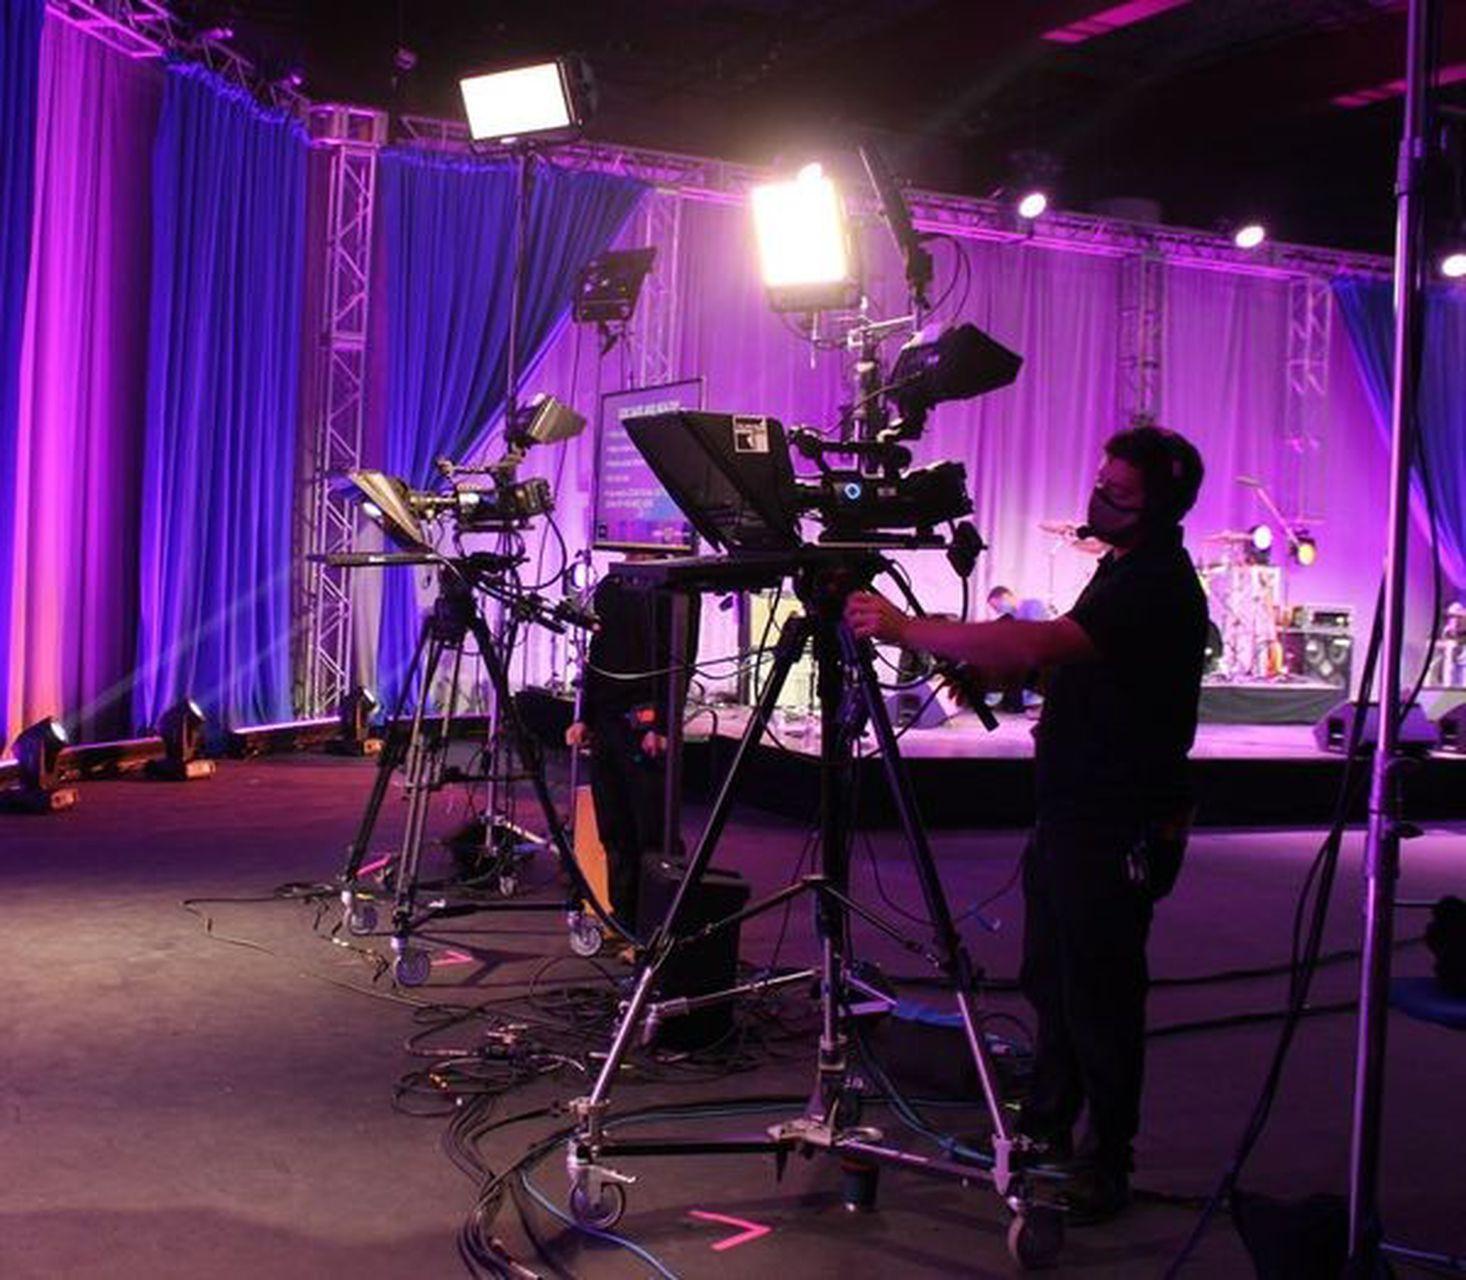 Camera crew filming a fundraising event